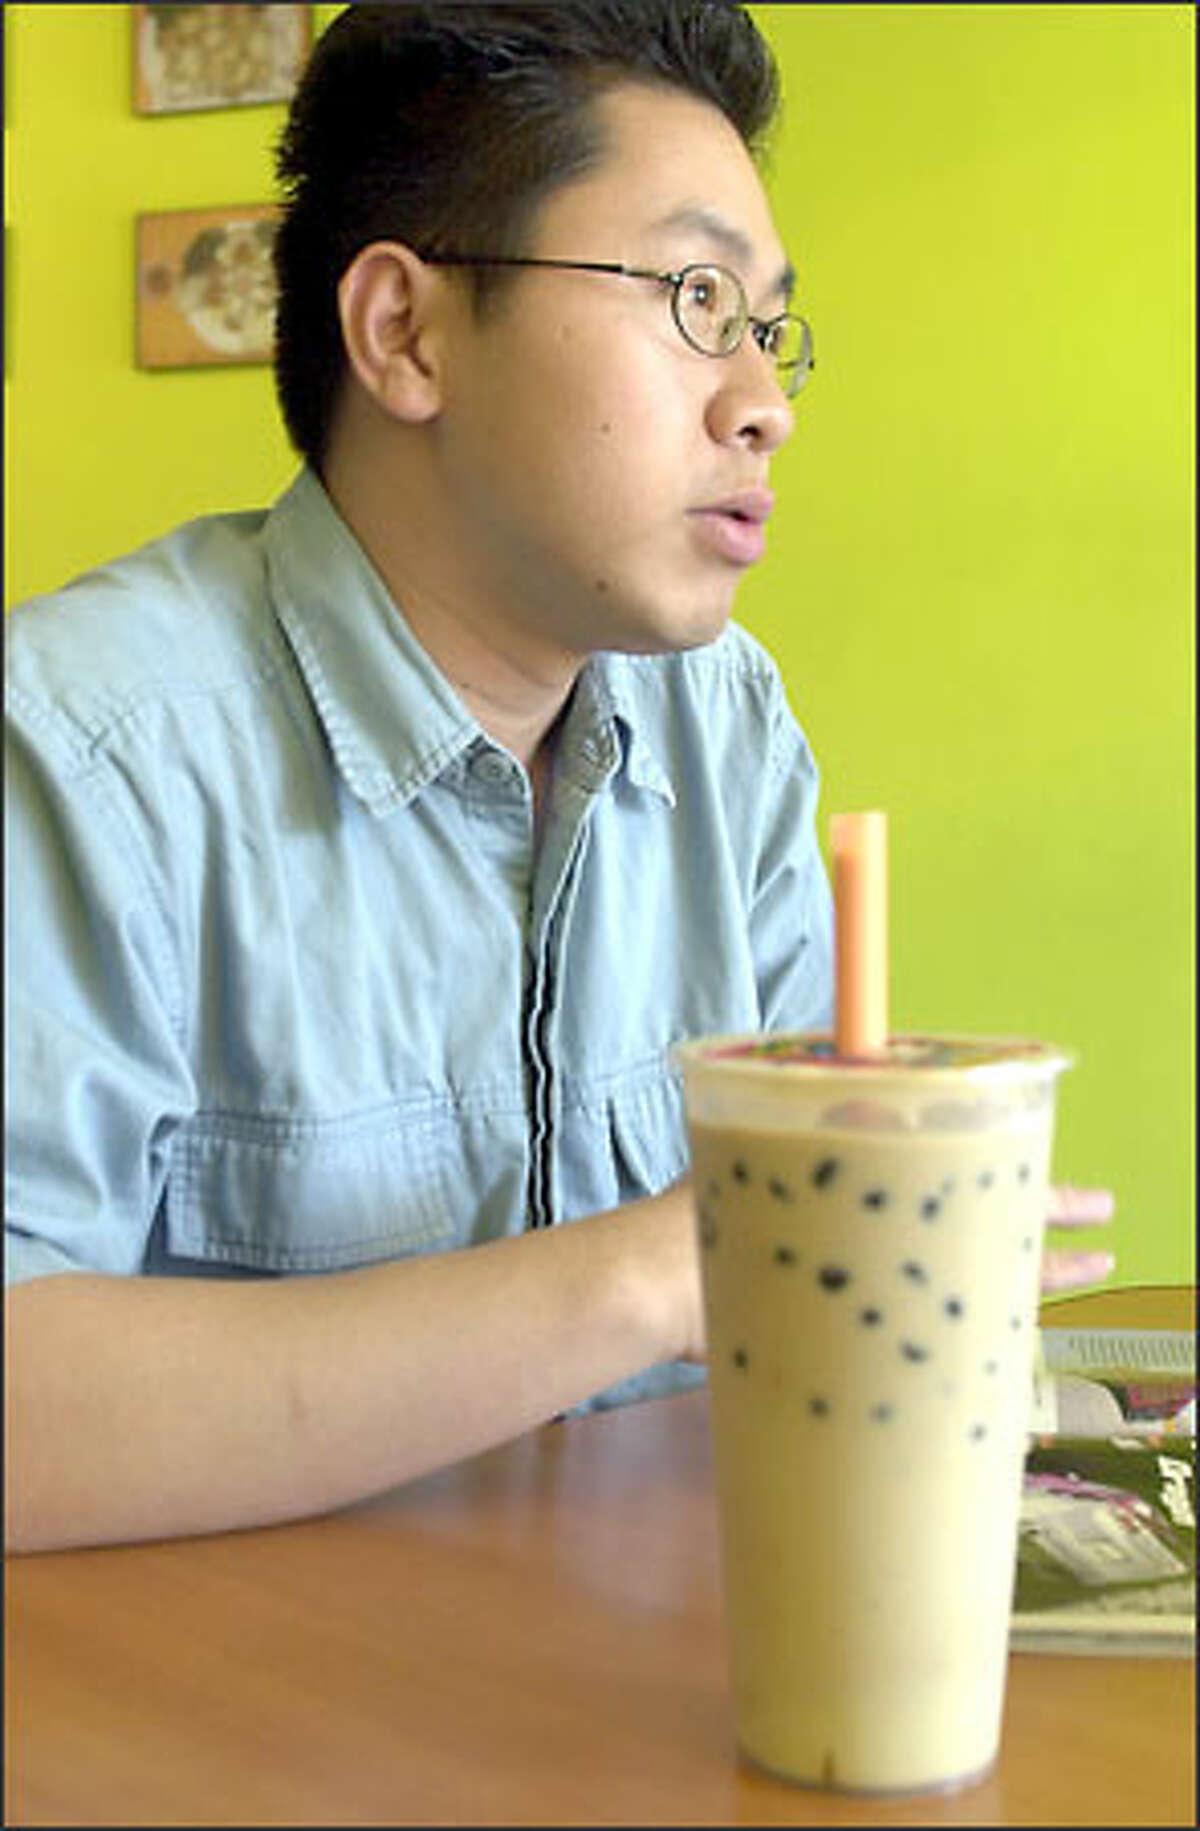 Hendy Hartono of Seattle takes a break with his favorite bubble tea flavor, avocado, at the Pochi Tea Station in the U District.